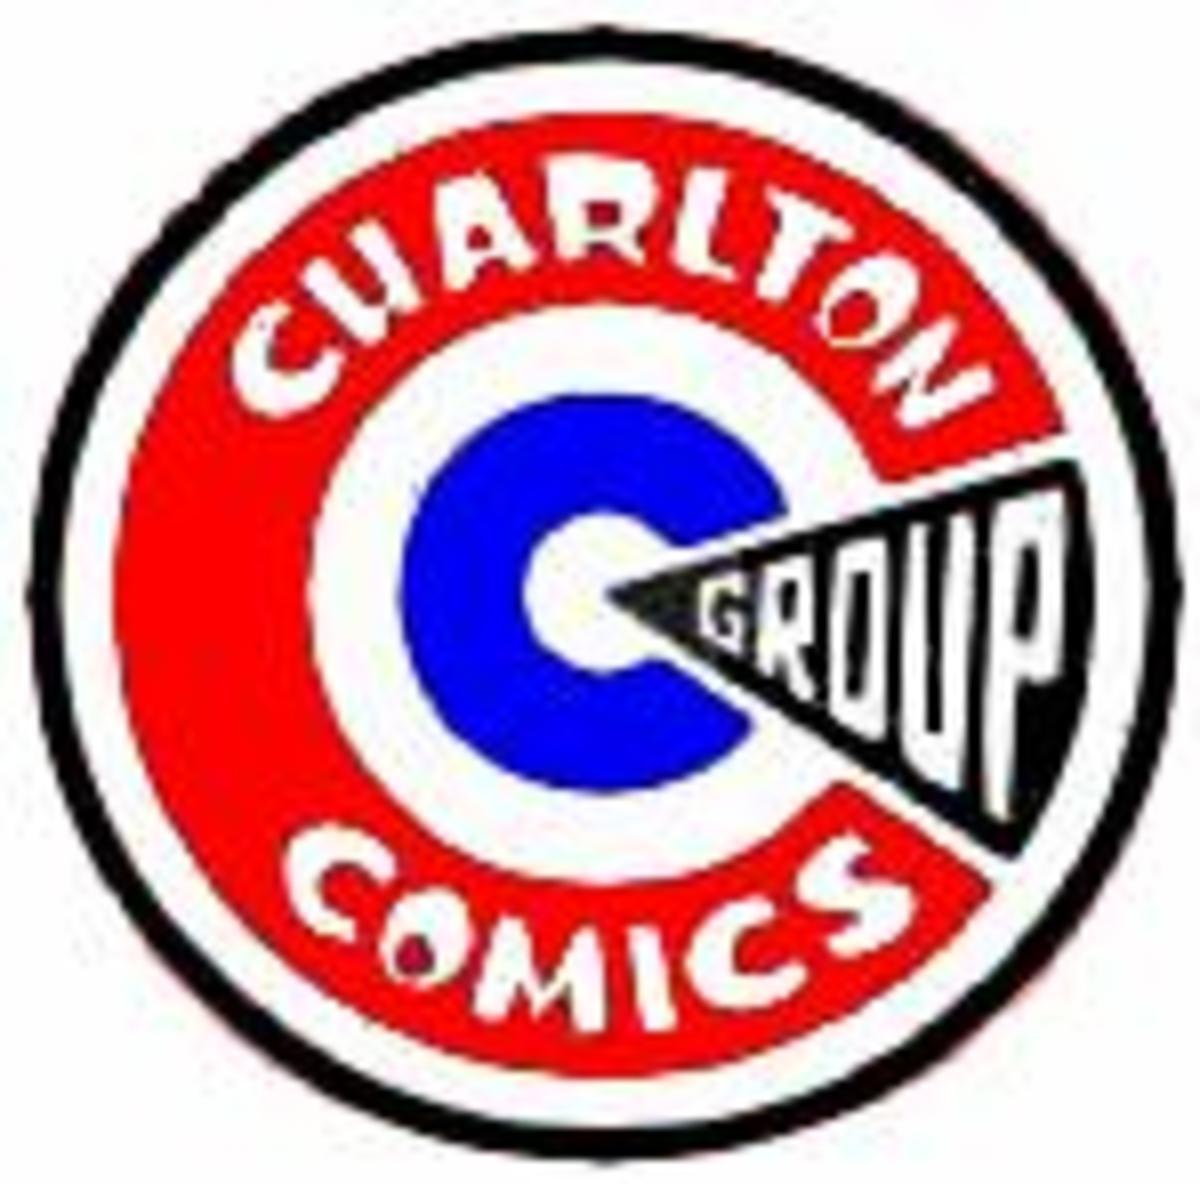 Charlton's 1970s logo.